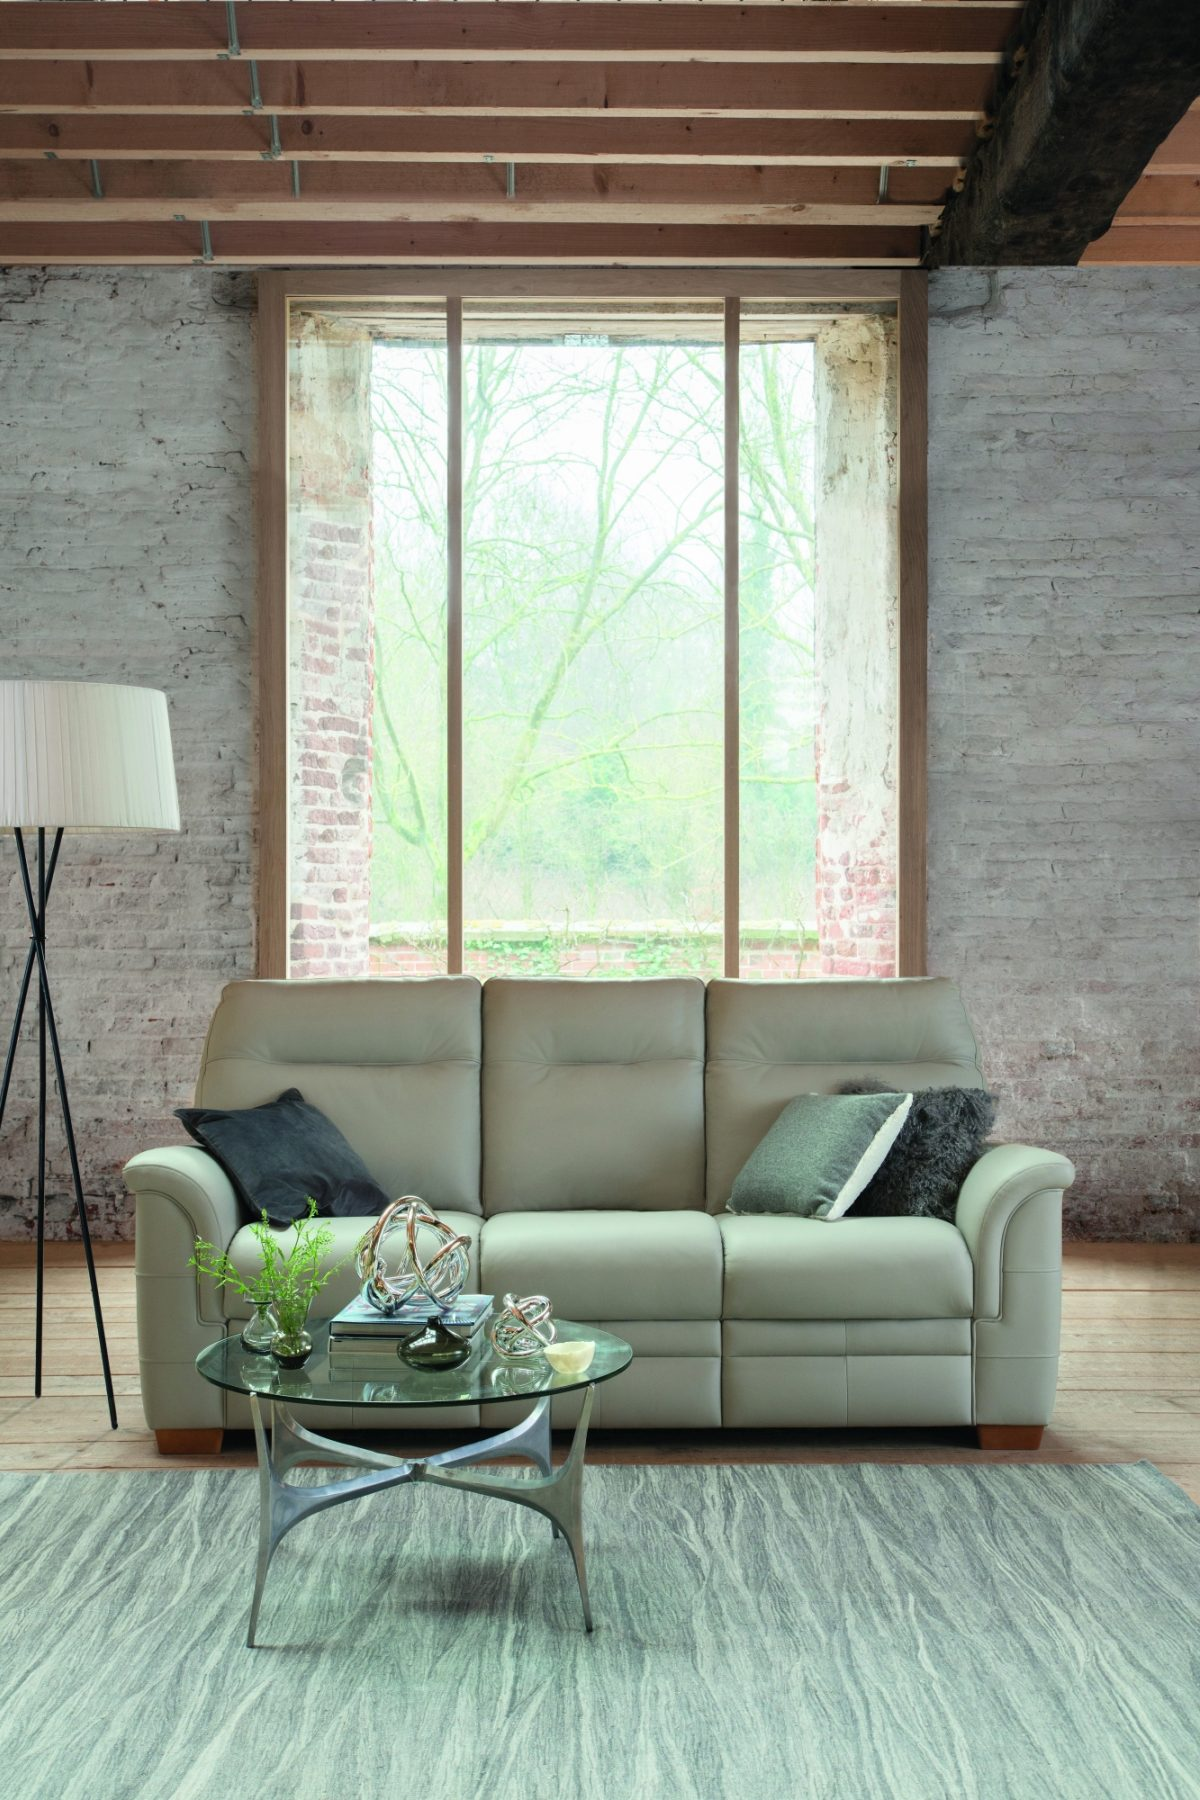 3603 Pk Hudson 3 Str Sofa Como Dove Dsc2717 Rt4 Rt5 Cb1